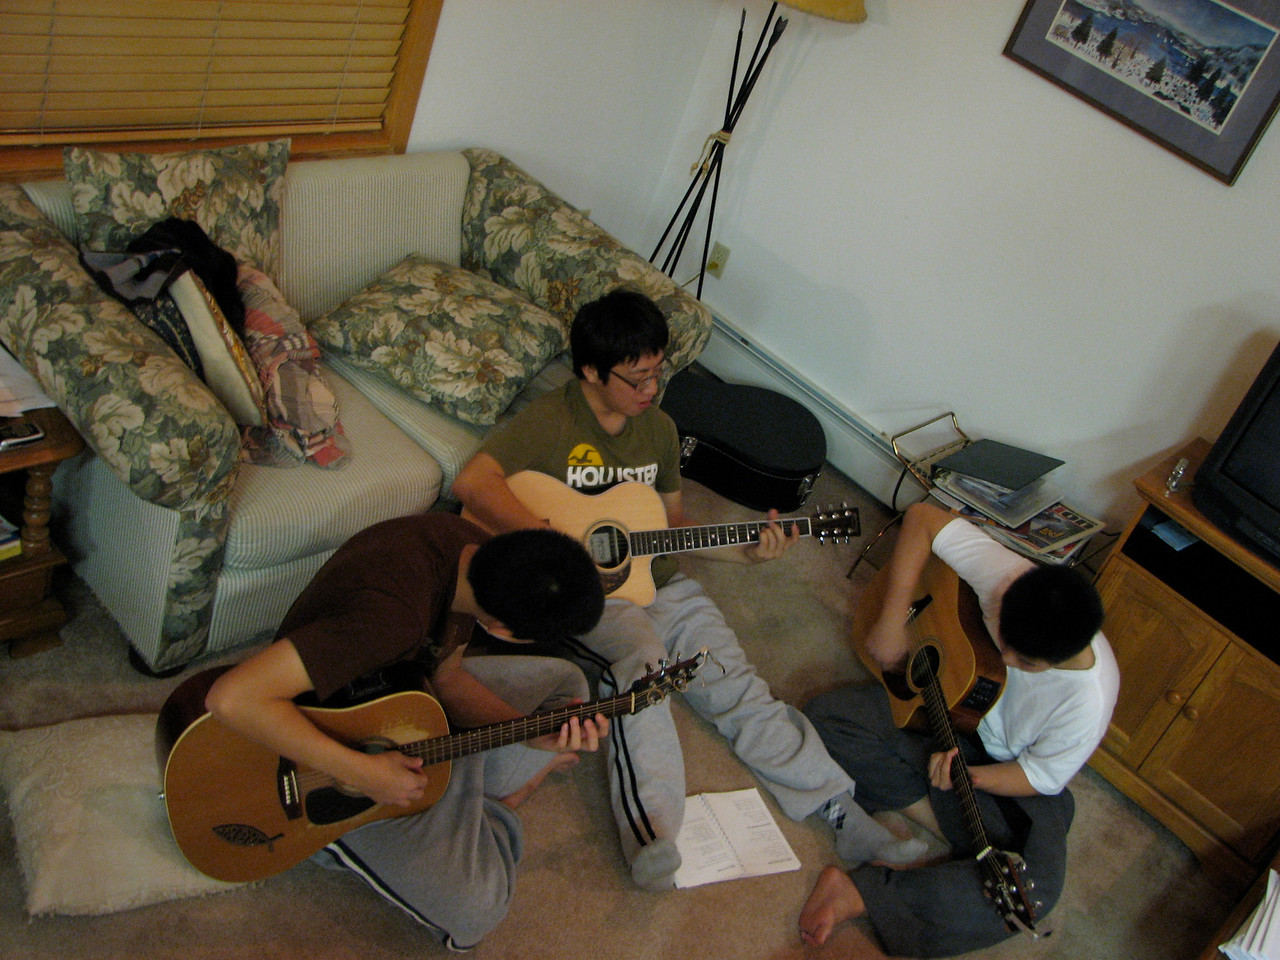 2006 12 22 Fri - Doug Kang, Junghan Kim, & Isaac Chu jamming 1